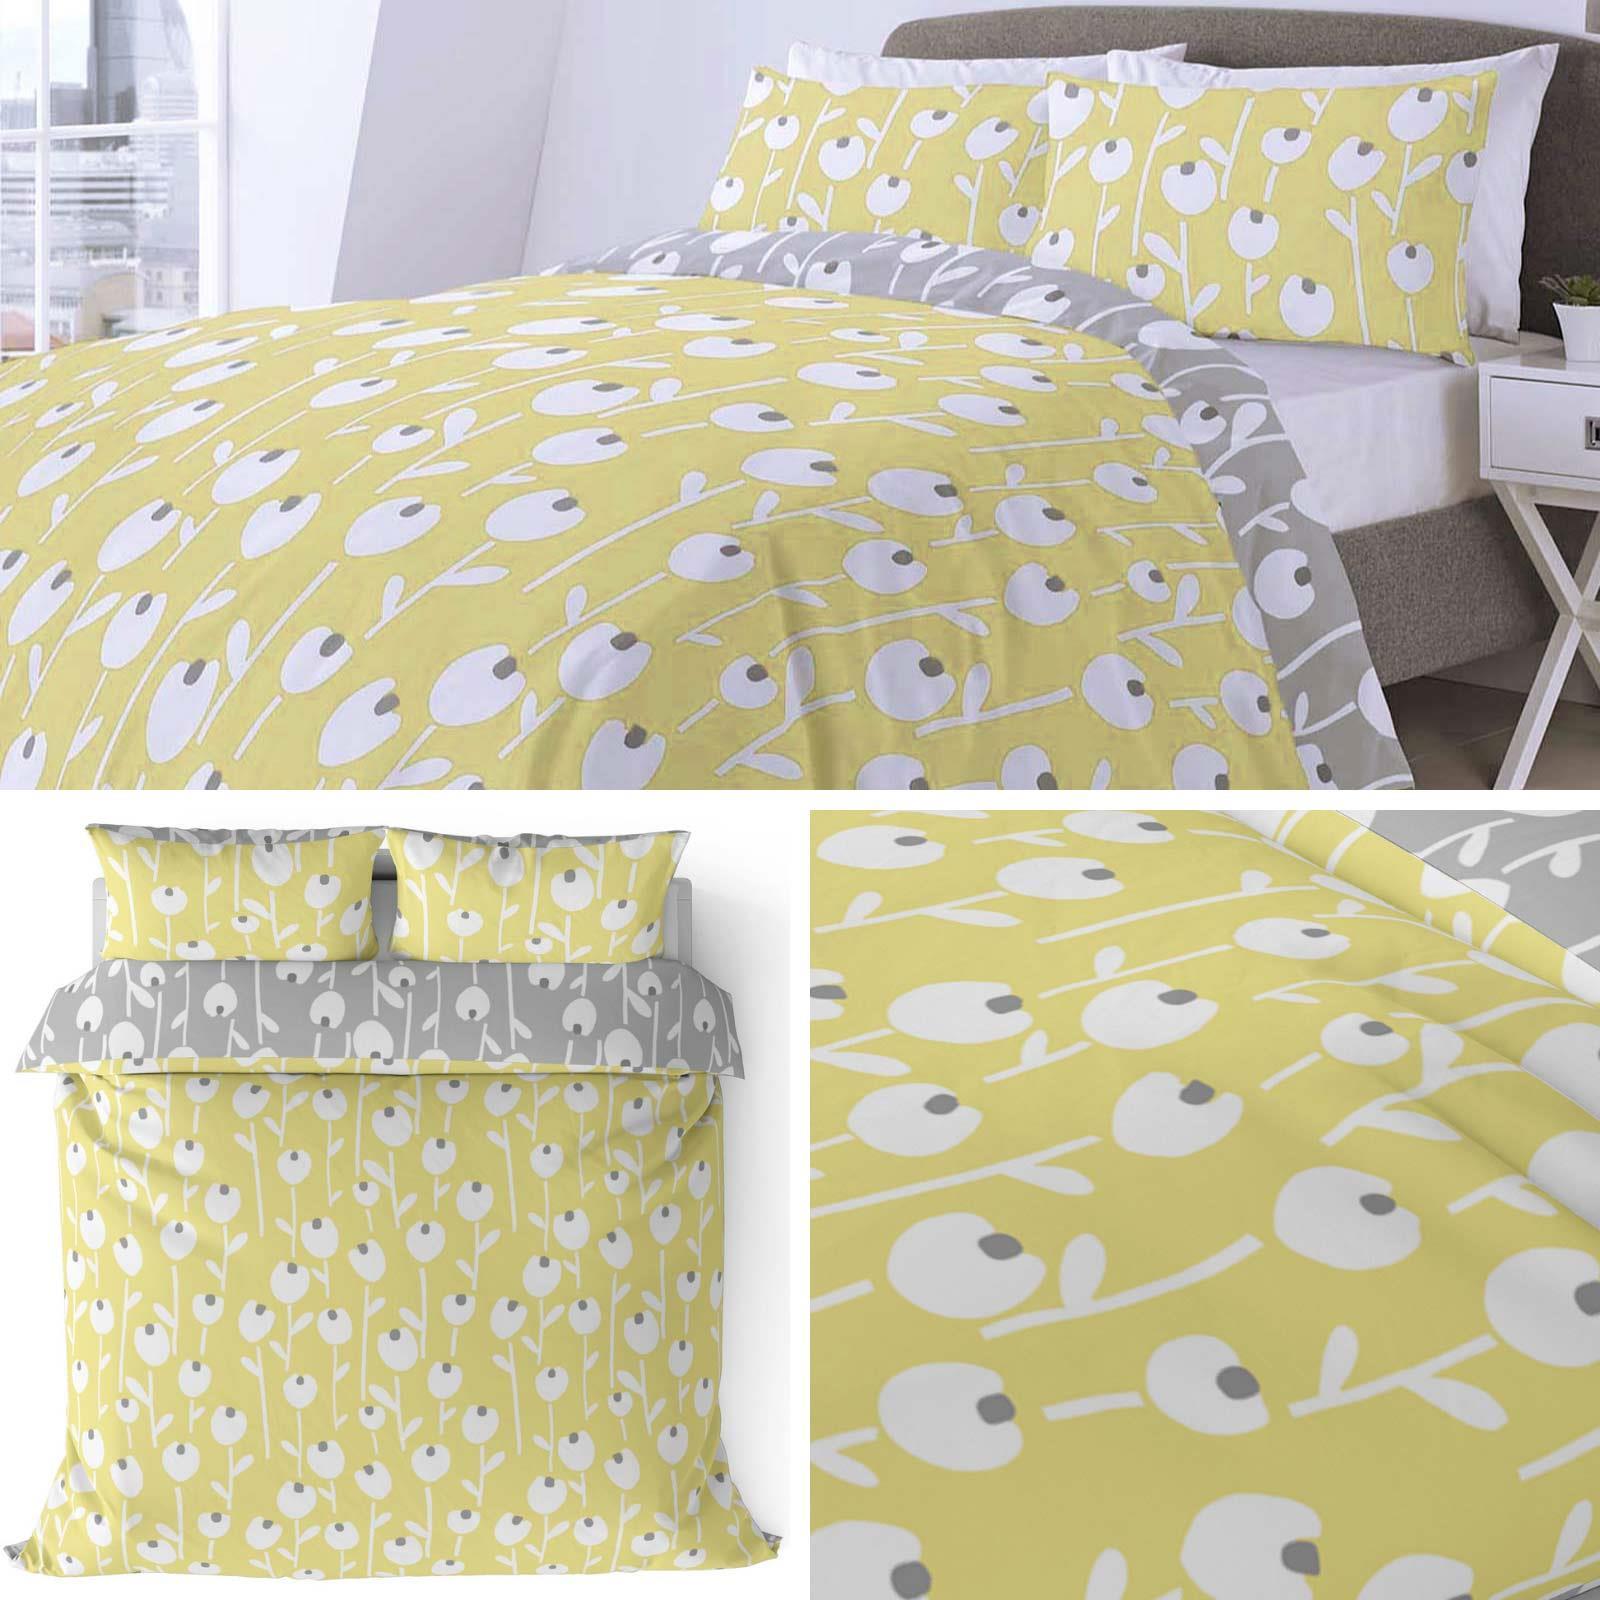 Ochre-Duvet-Covers-Scandi-Retro-Floral-Yellow-Reversible-Quilt-Cover-Bedding-Set